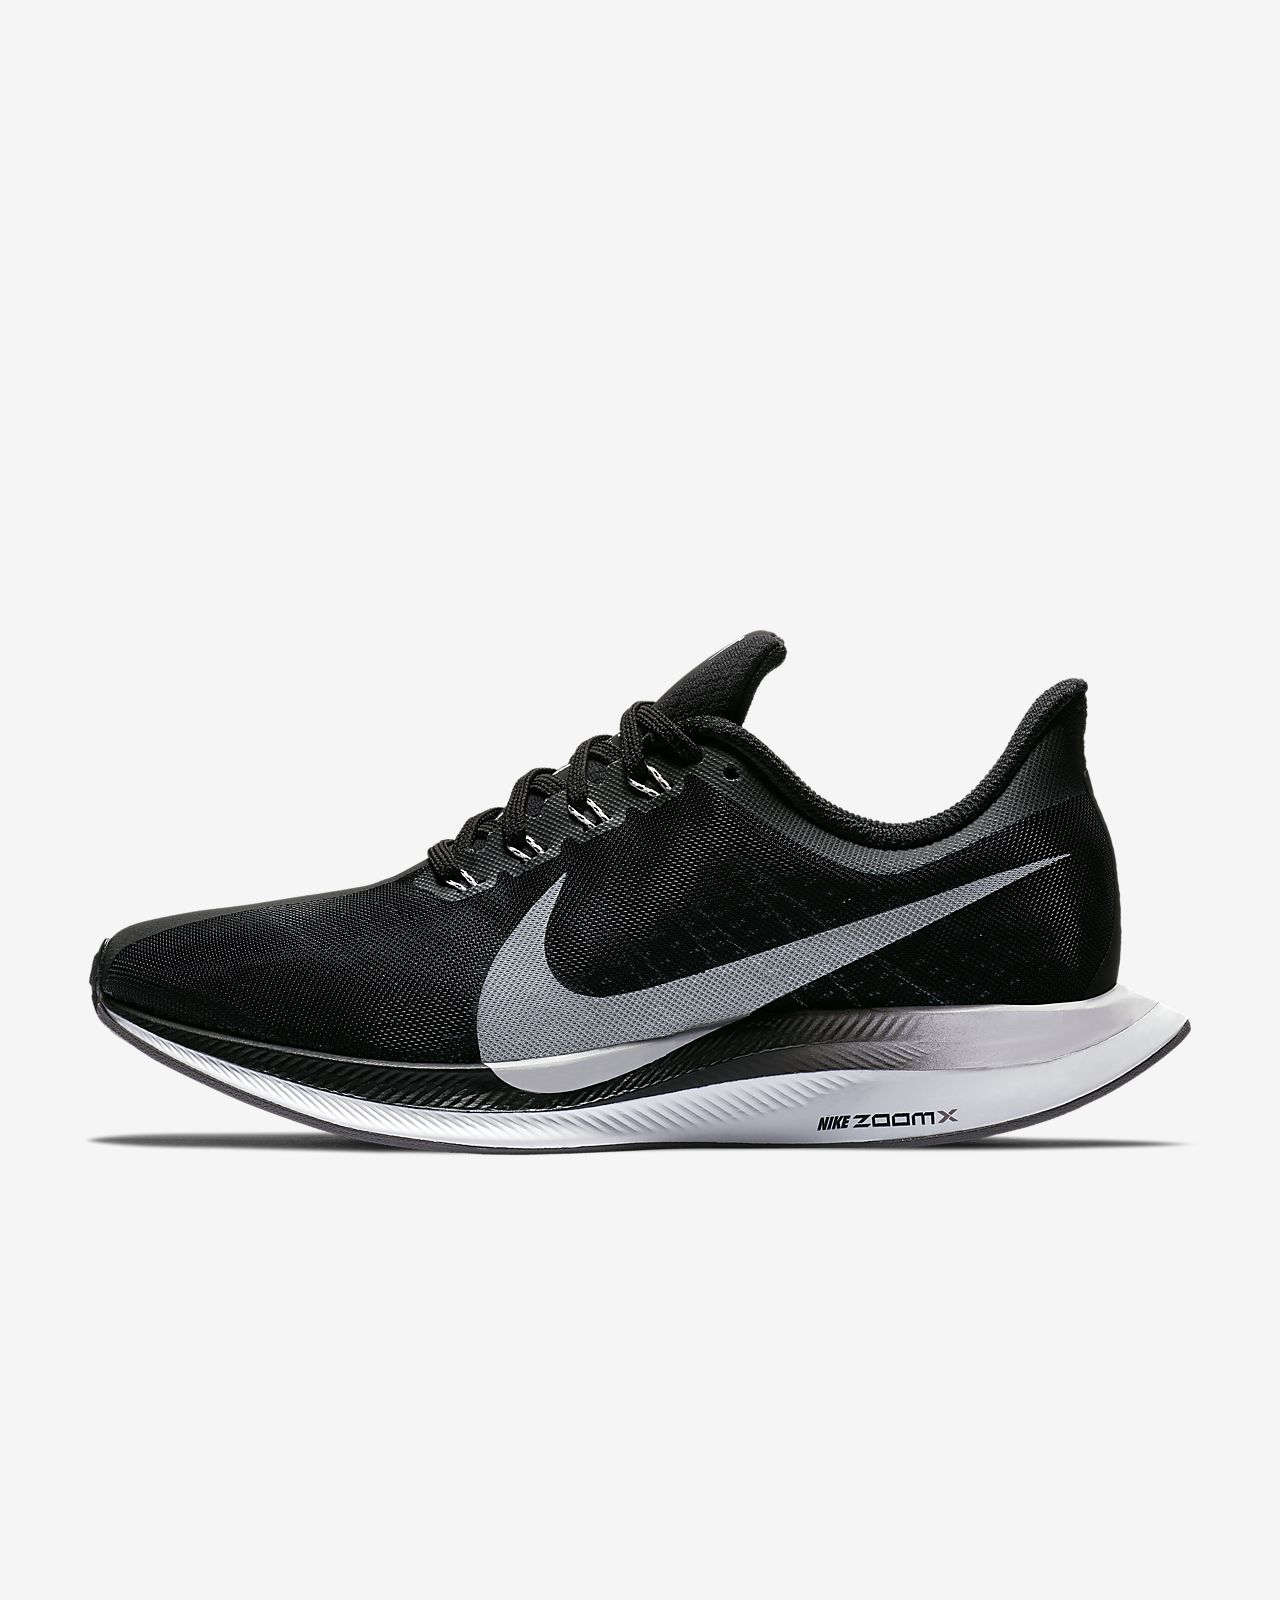 2f8cc1e27cf Nike Zoom Pegasus Turbo Zapatillas de running - Mujer. Nike.com ES